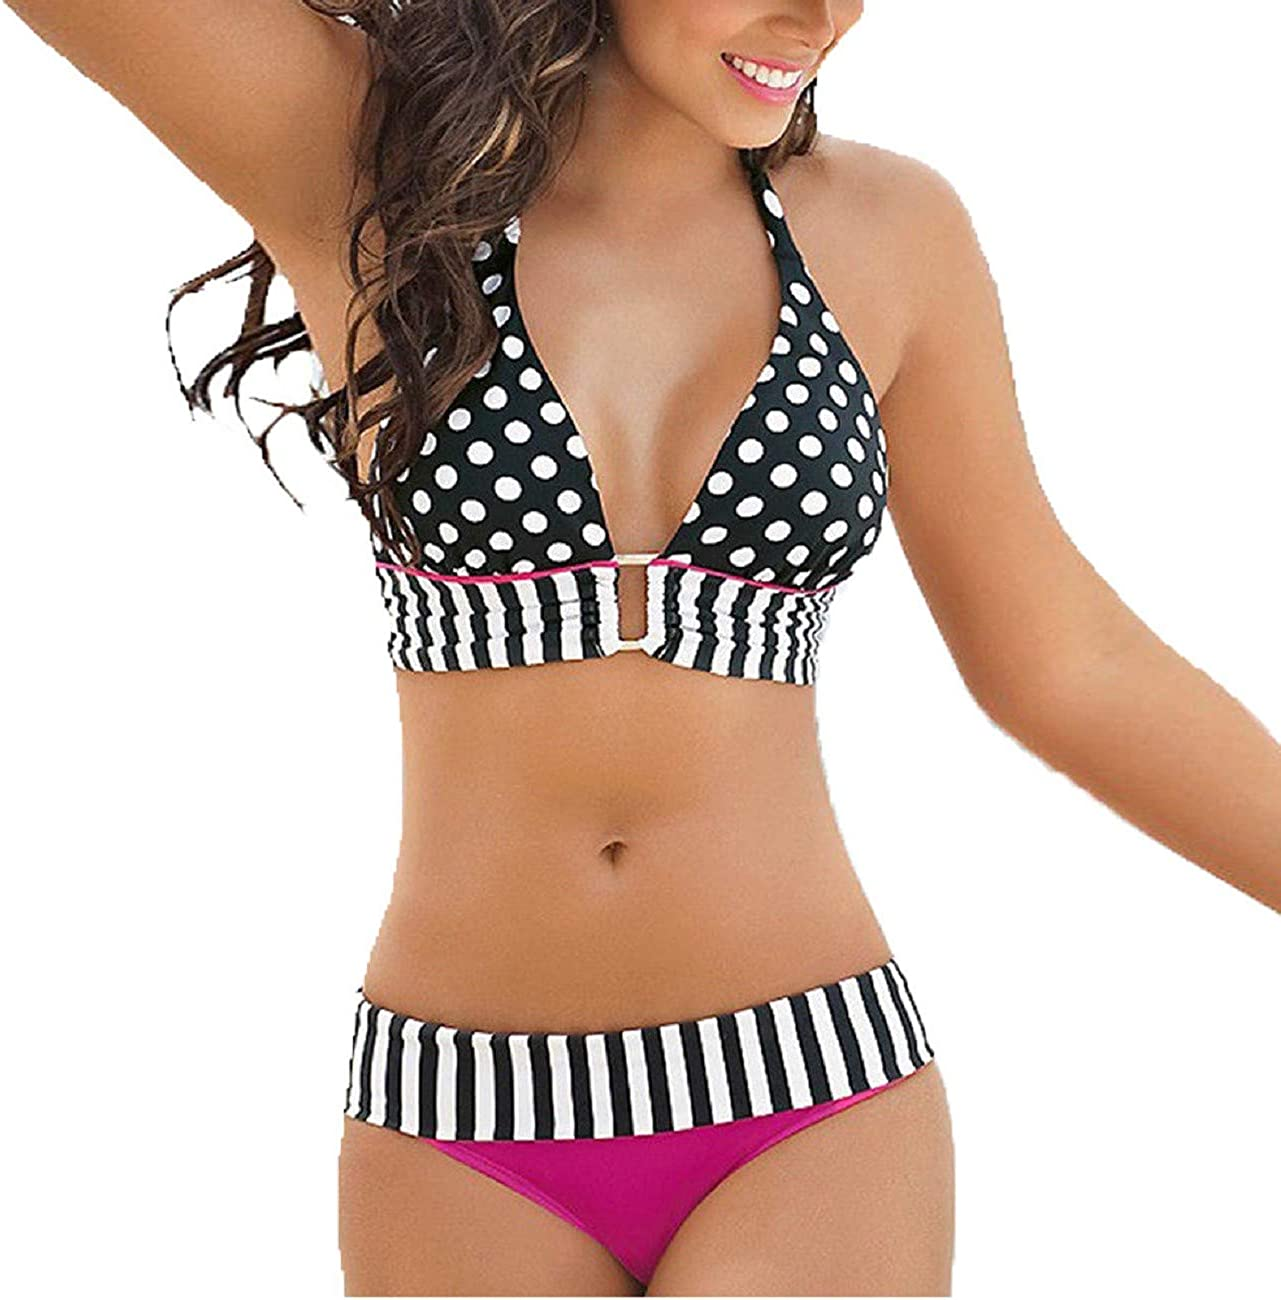 Adreamess Women Swimwear Stripe Polka Dot Print Bikini Set Bandage Push-Up Swimsuit Bathing Beachwear